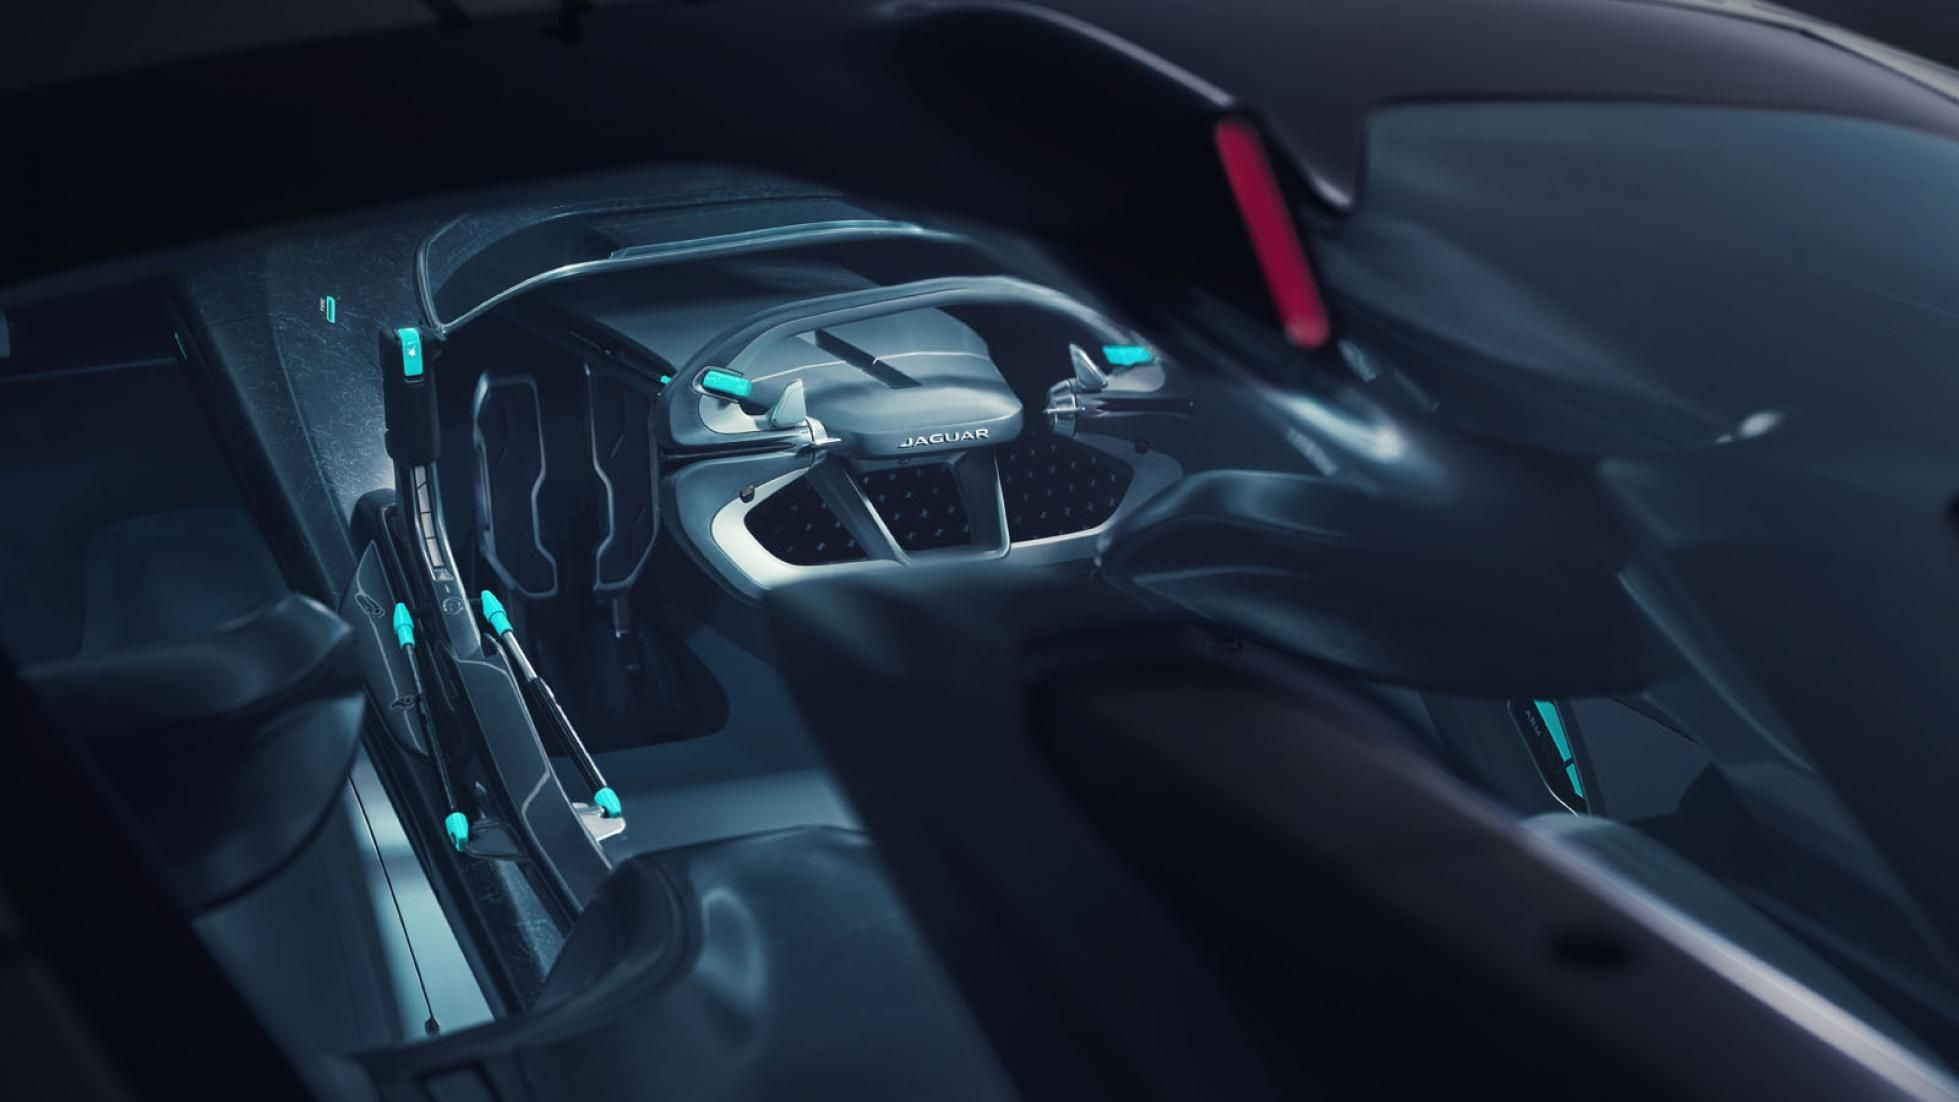 Jaguar Vision GT SV 8 carro elétrico, Gran Turismo, Gran Turismo Sport, GT, Jaguar, Jaguar Vision GT SV